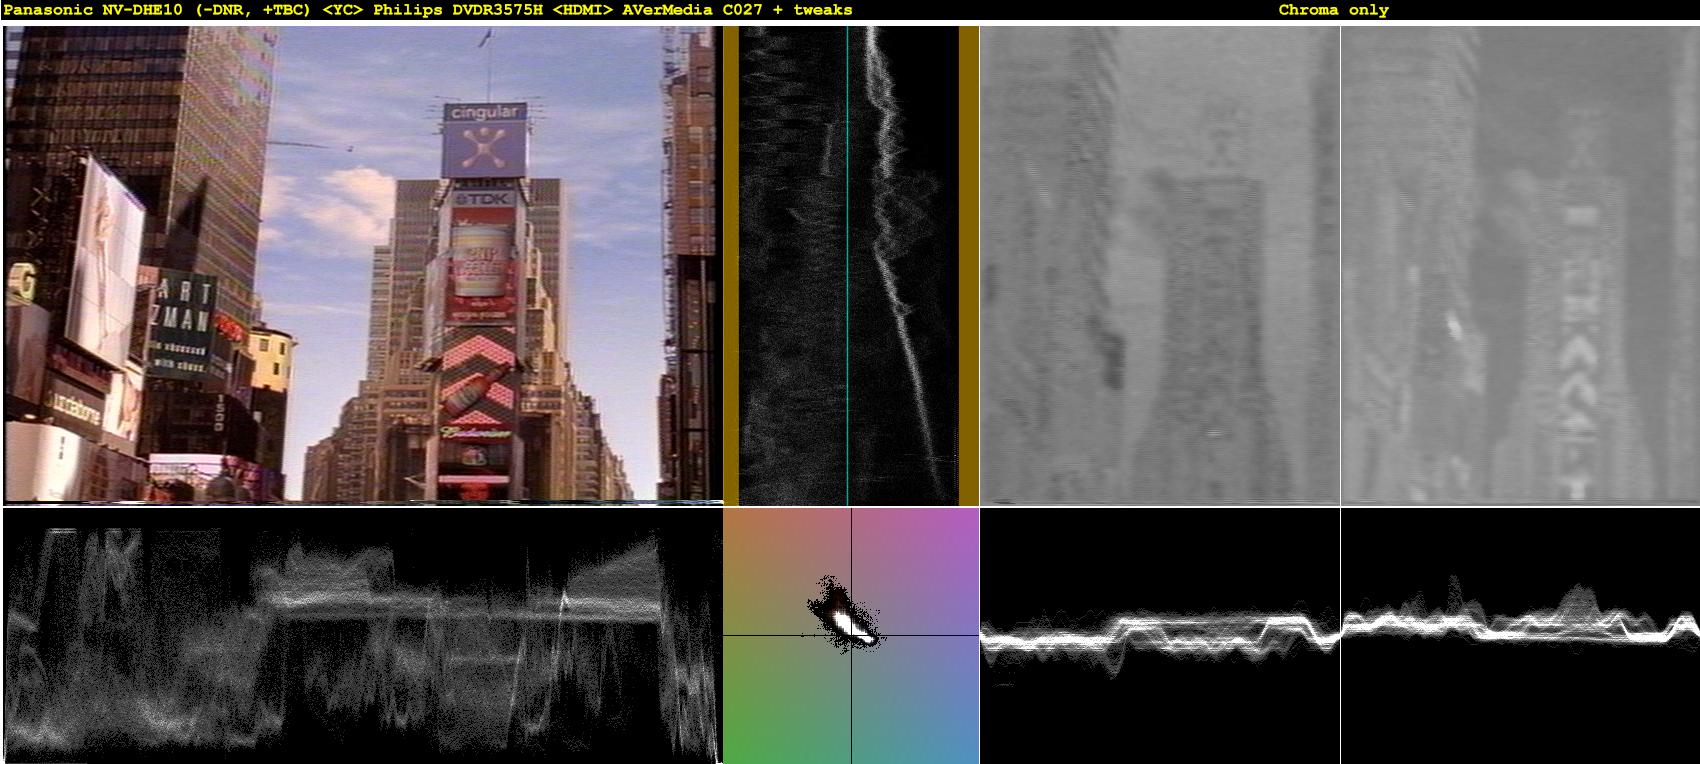 Click image for larger version  Name:1-14-17 - Panasonic NV-DHE10 (-DNR, +TBC).png Views:1488 Size:1.12 MB ID:37999